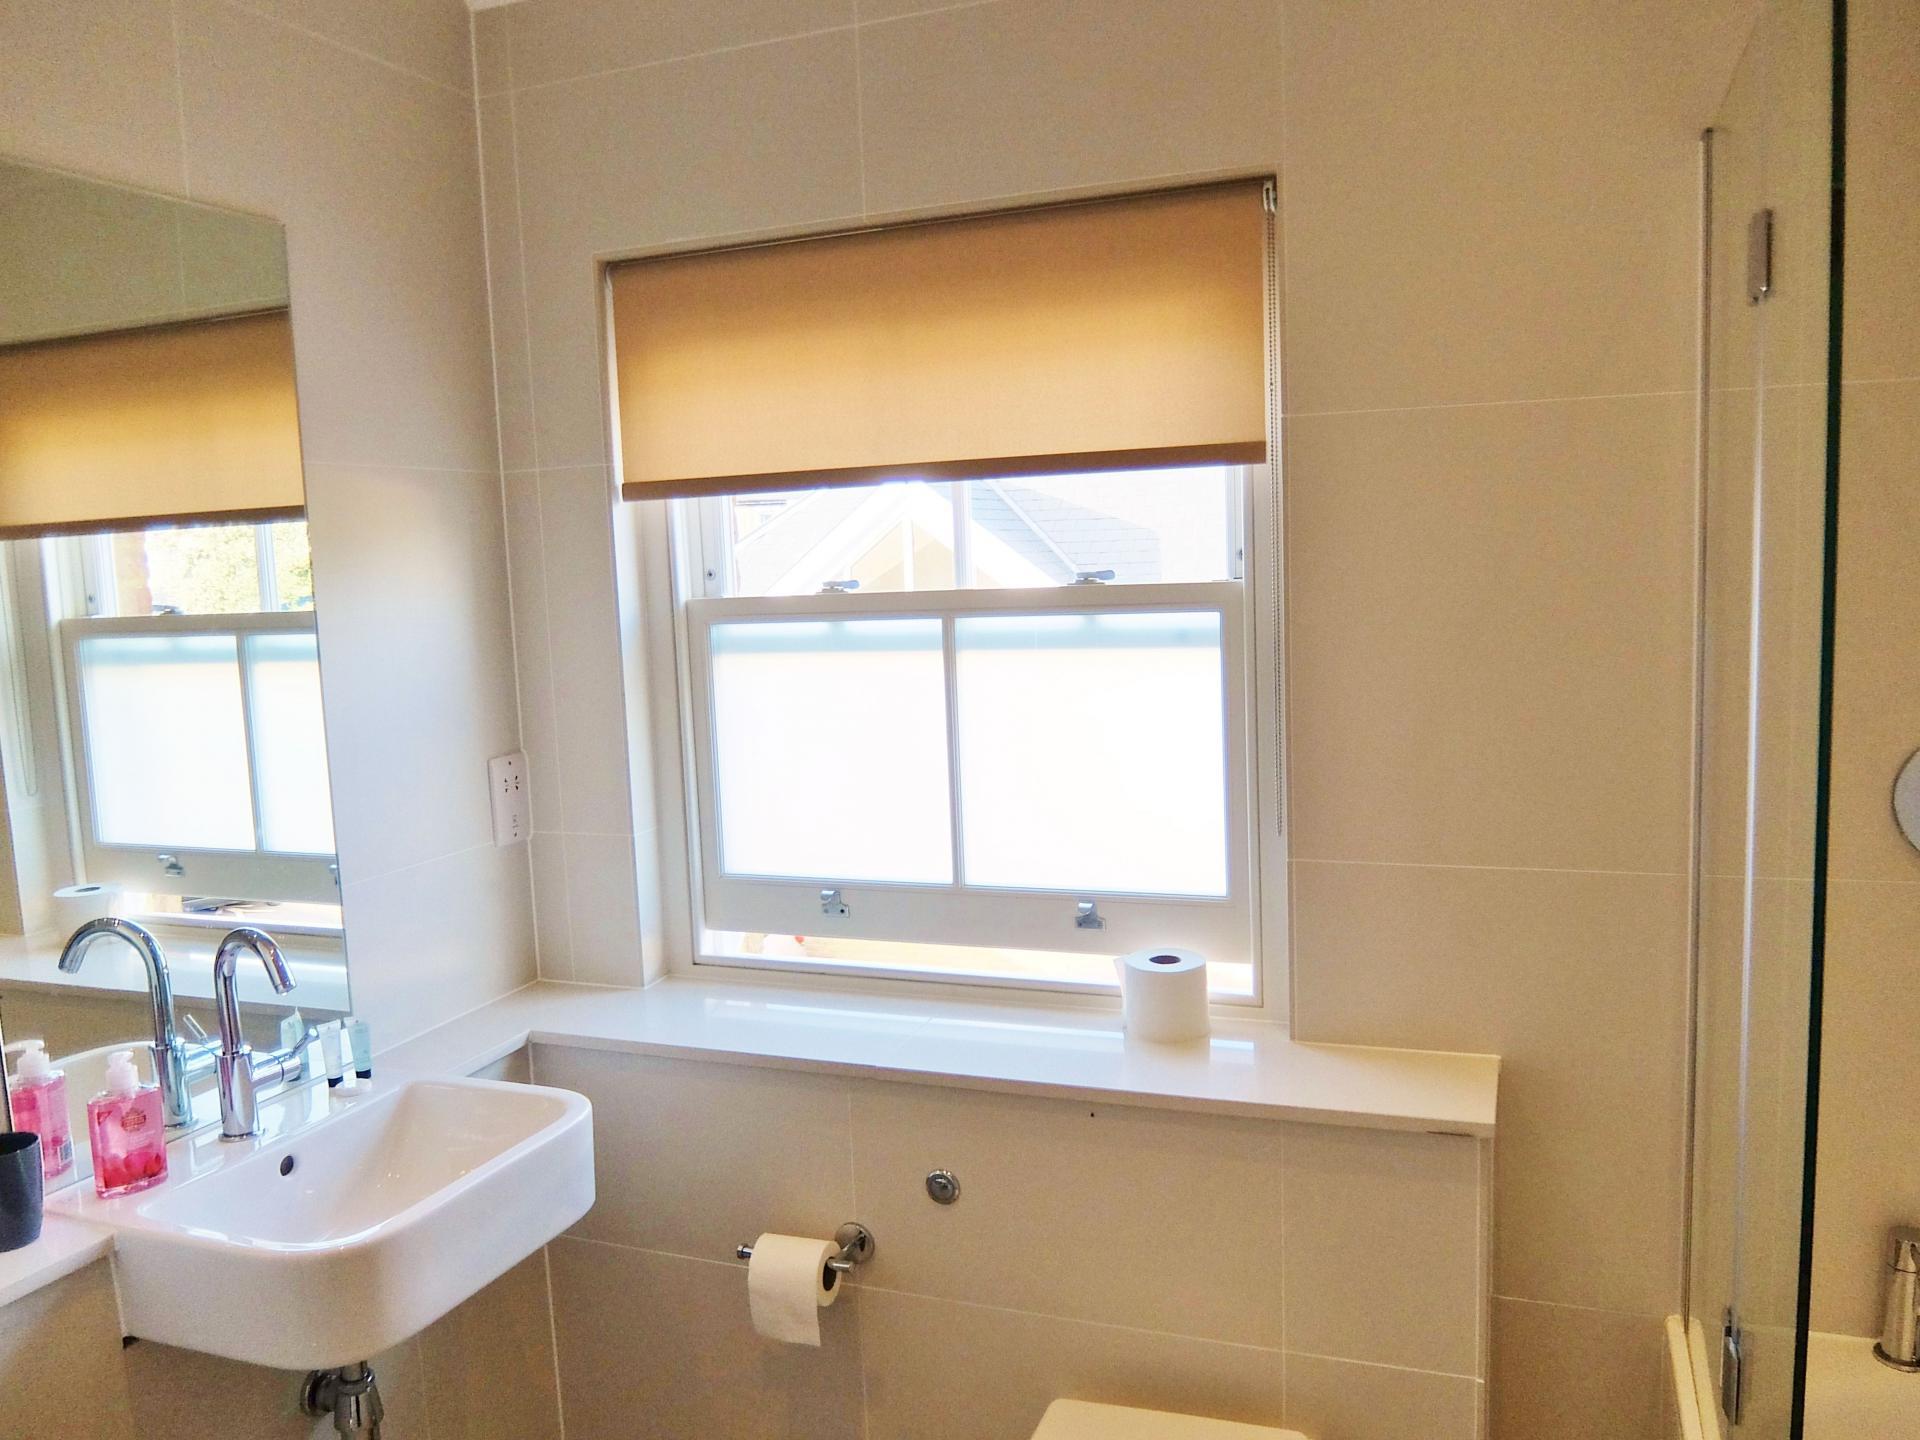 En-suite at Twickenham Newland Apartments, Twickenham, London - Citybase Apartments